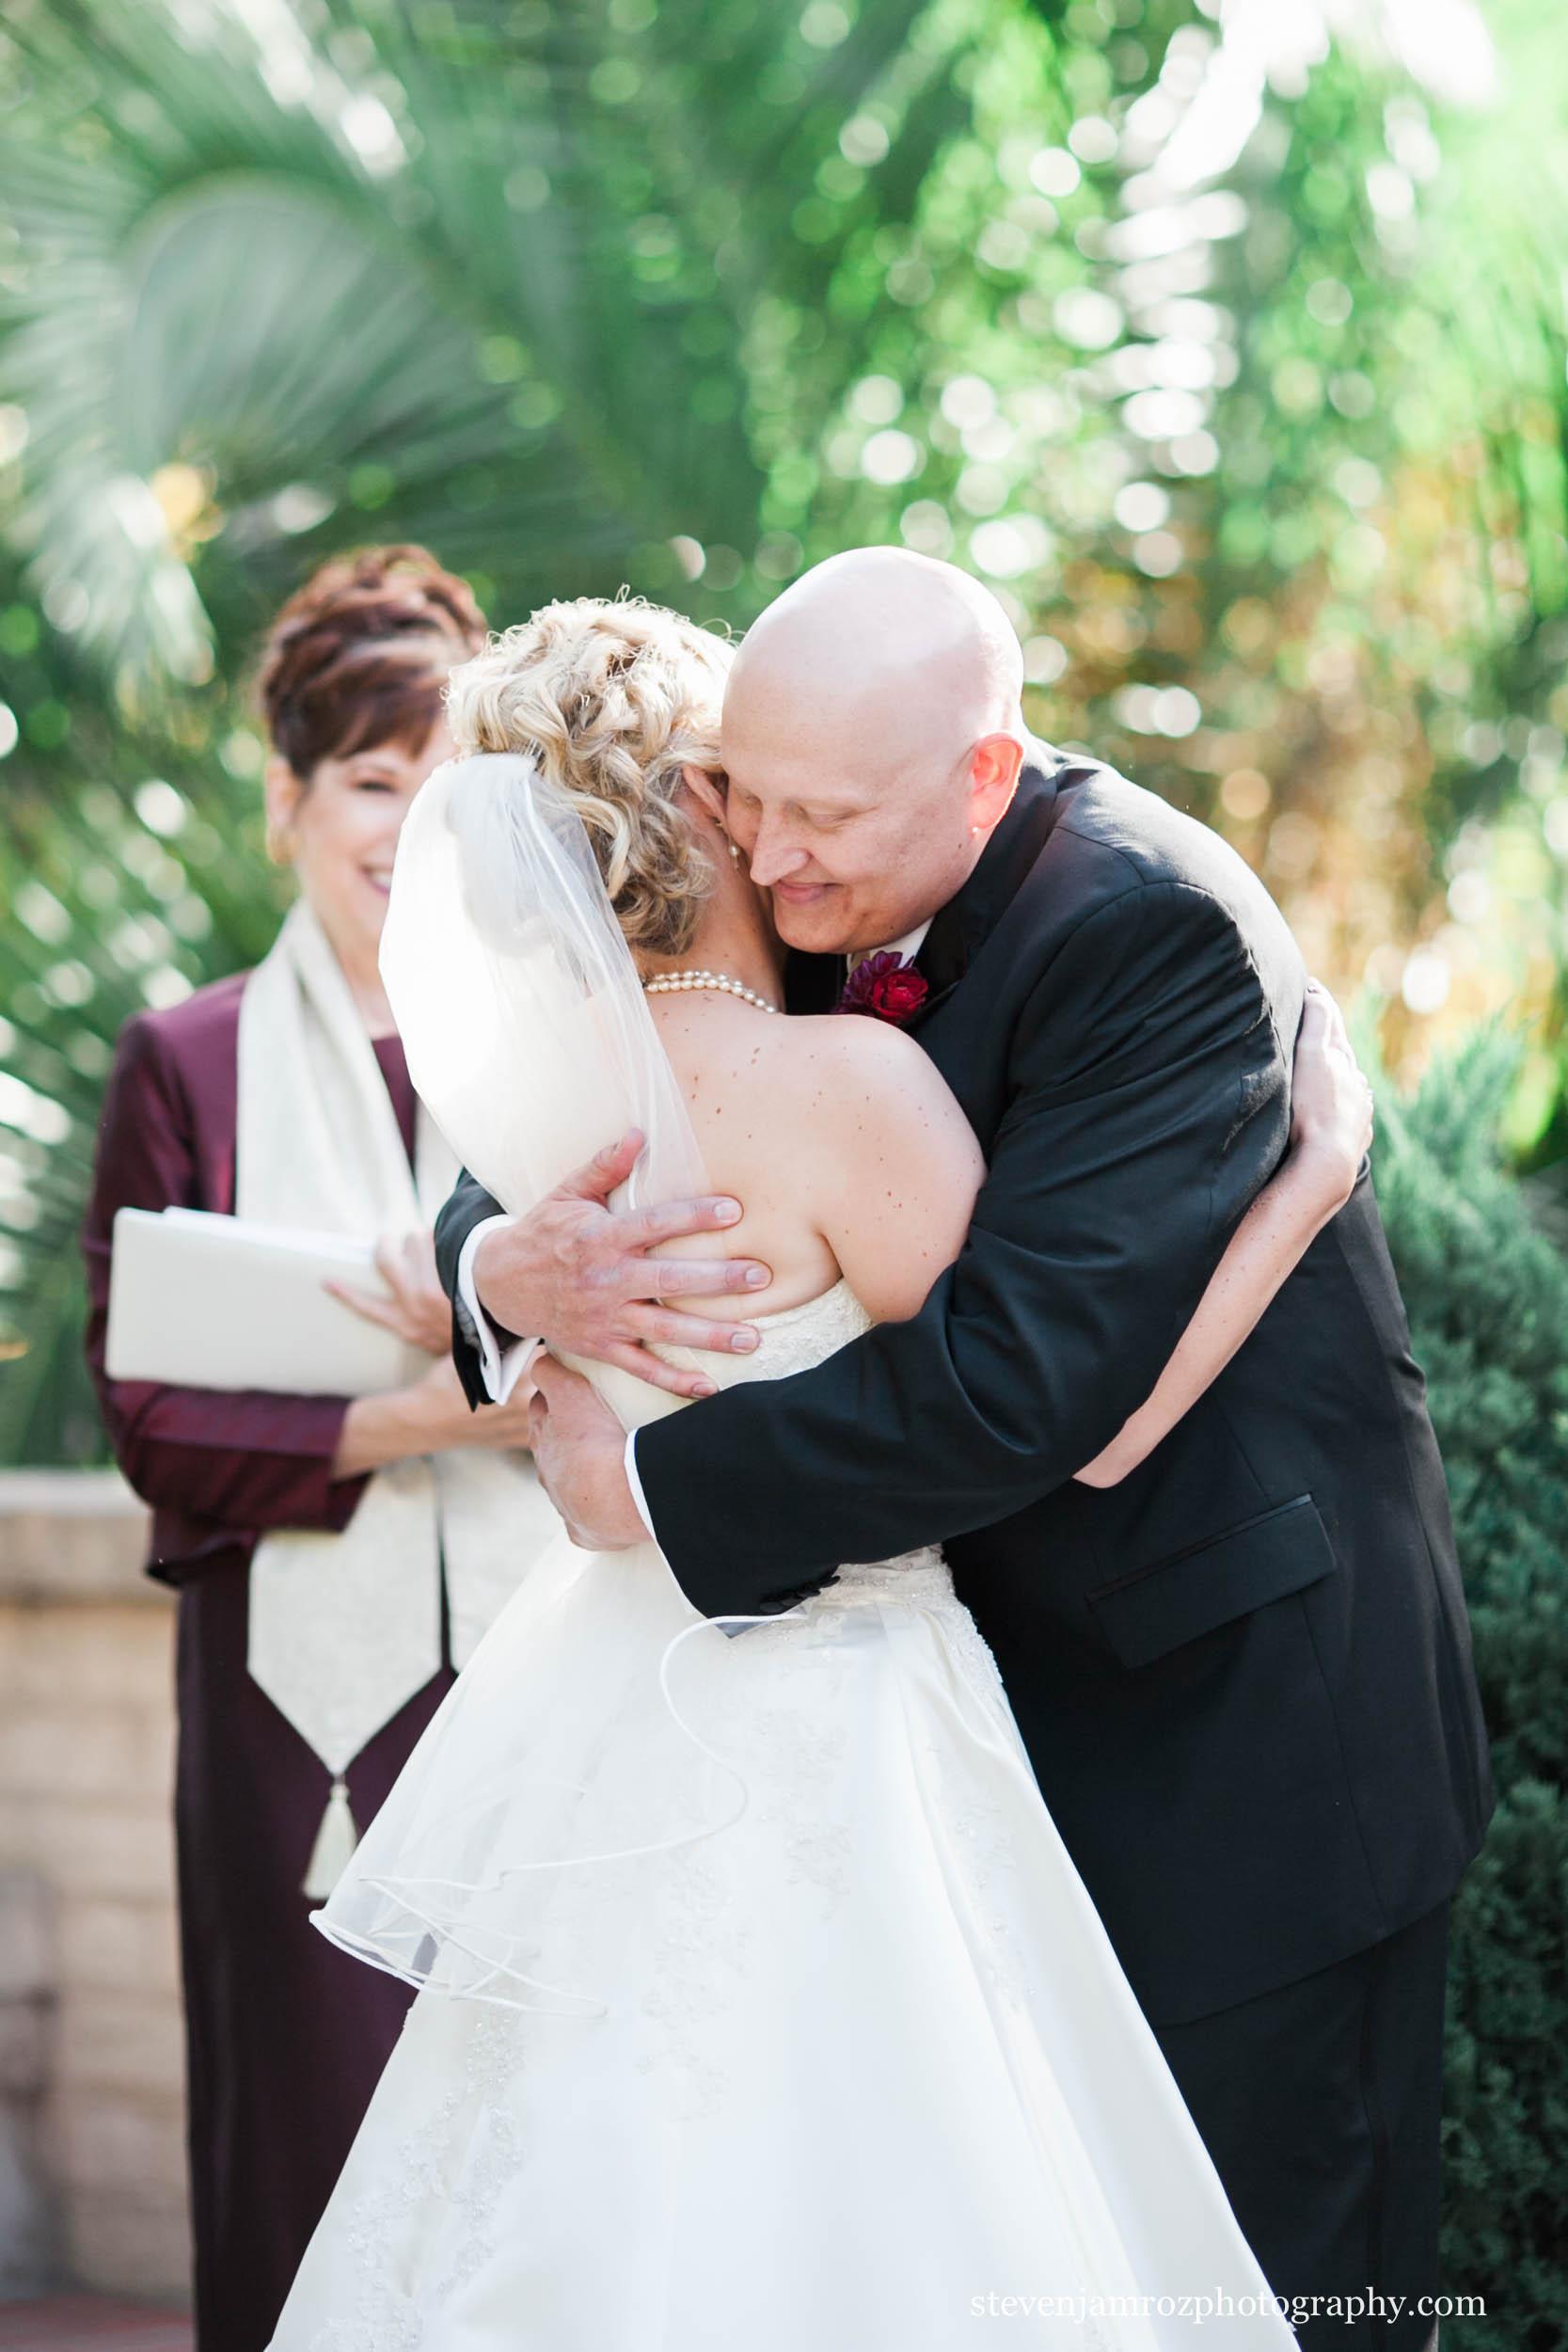 just-married-bride-groom-hug-steven-jamroz-photography-0158.jpg